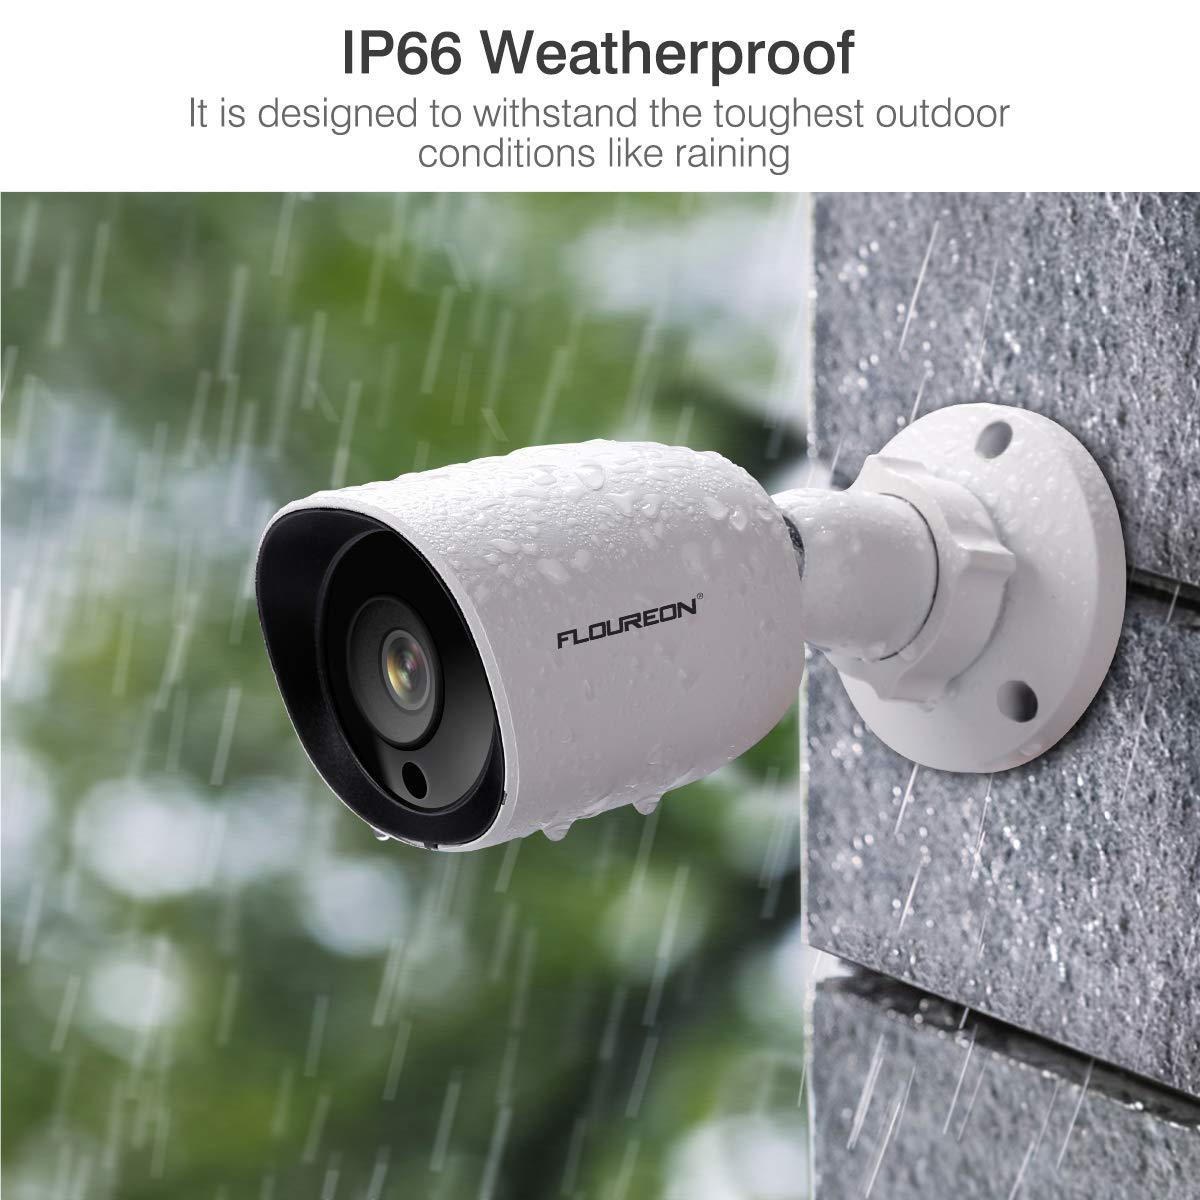 FLOUREON 1080P HD 3000TVL Dome Outdoor Security Surveillance CCTV Camera 4-in-1 TVI//AHD//CVI//Analog IP66 Weatherproof 940nm Invisible IR Night Vision with Metal Eyeball